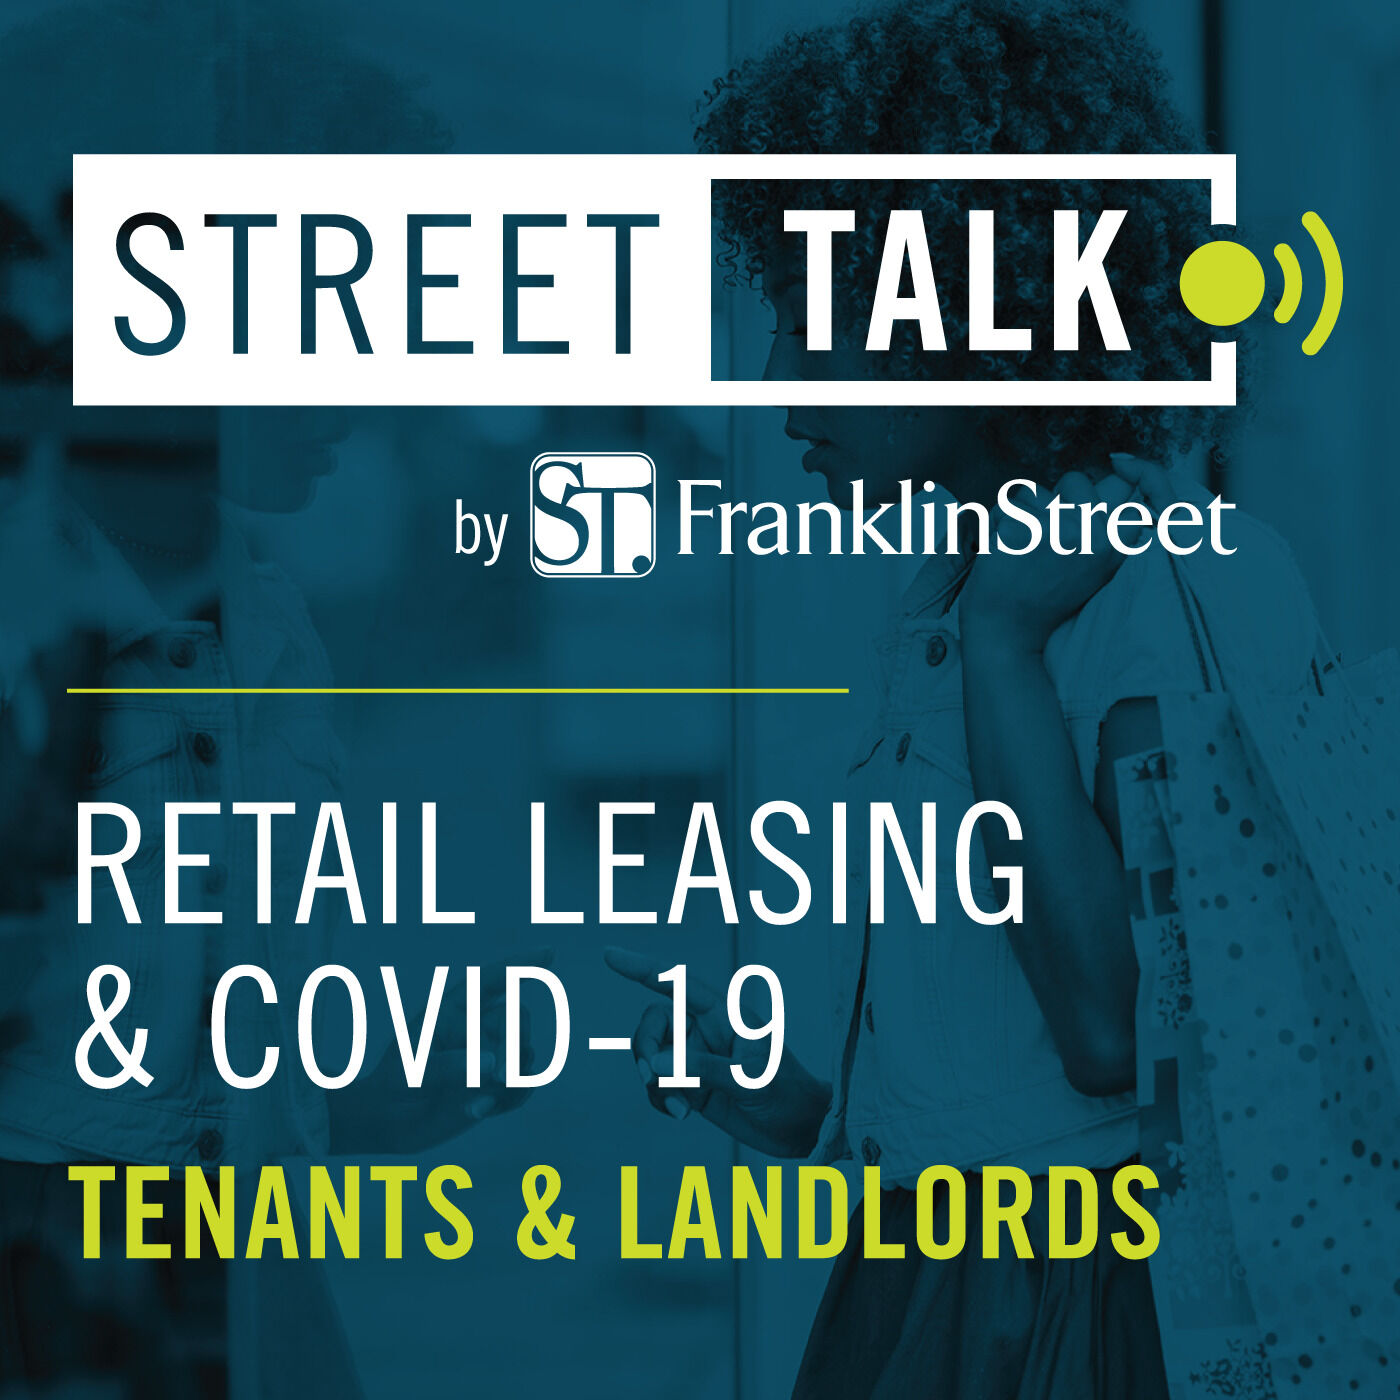 Retail Leasing & COVID-19: Tenants & Landlords